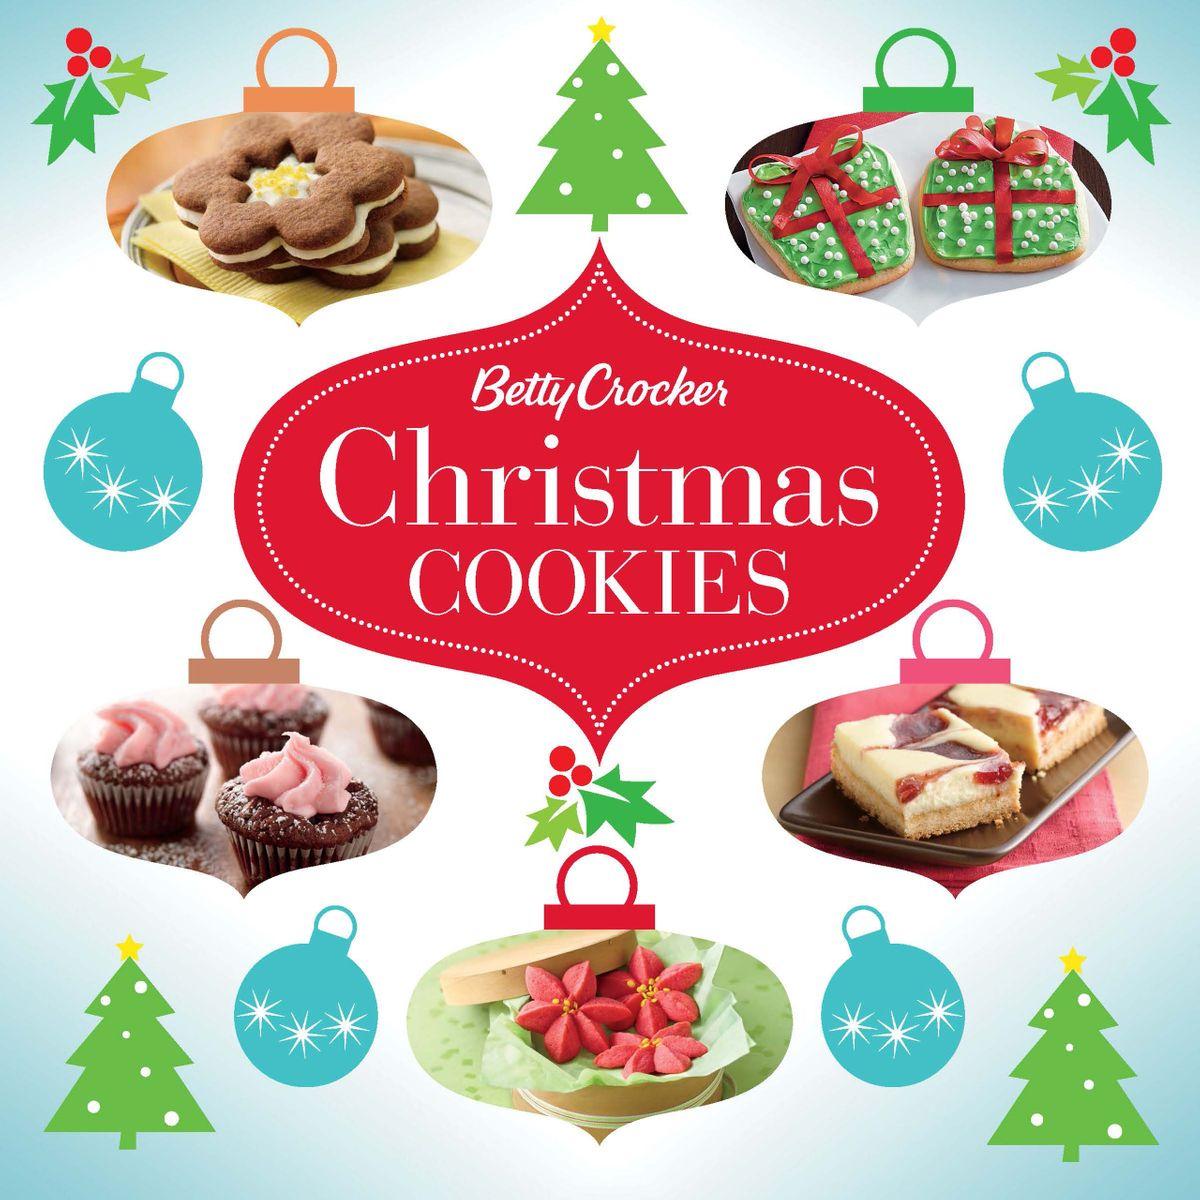 Betty Crocker Christmas Cookies Ebook By Betty Crocker